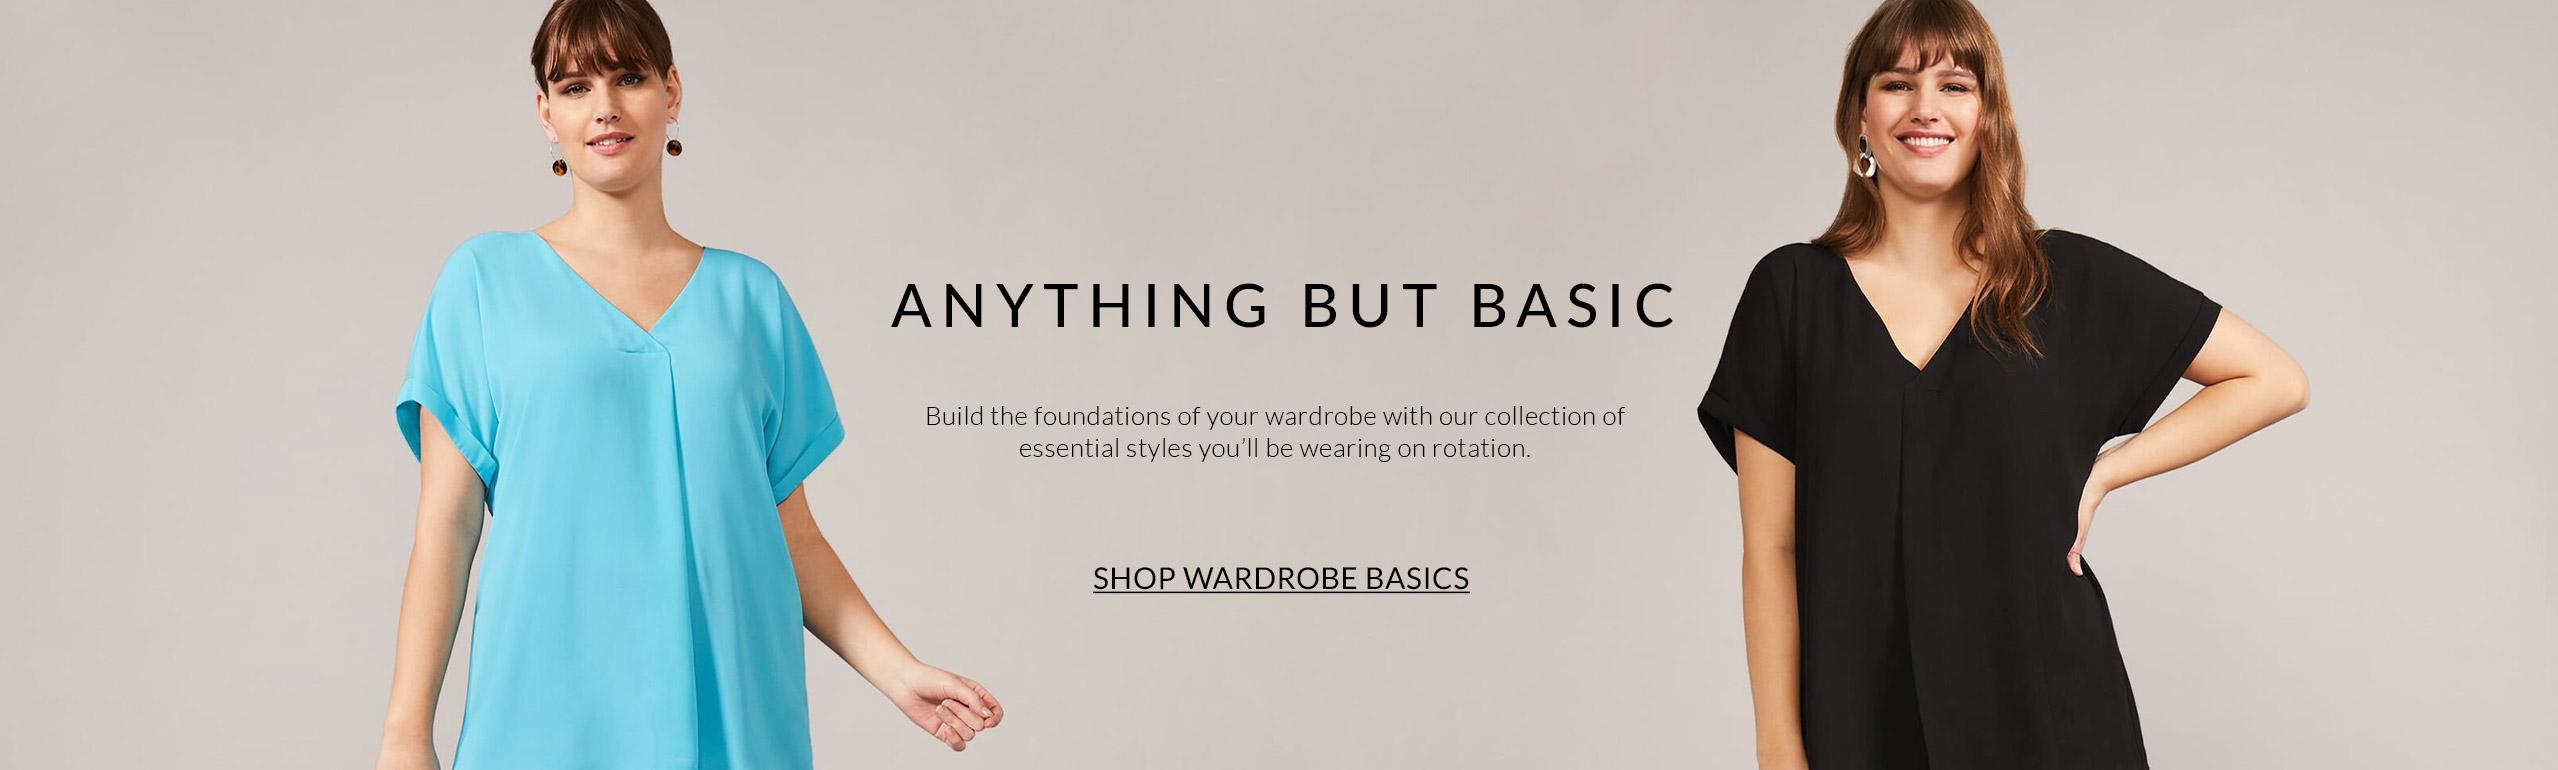 Shop Wardrobe Basics